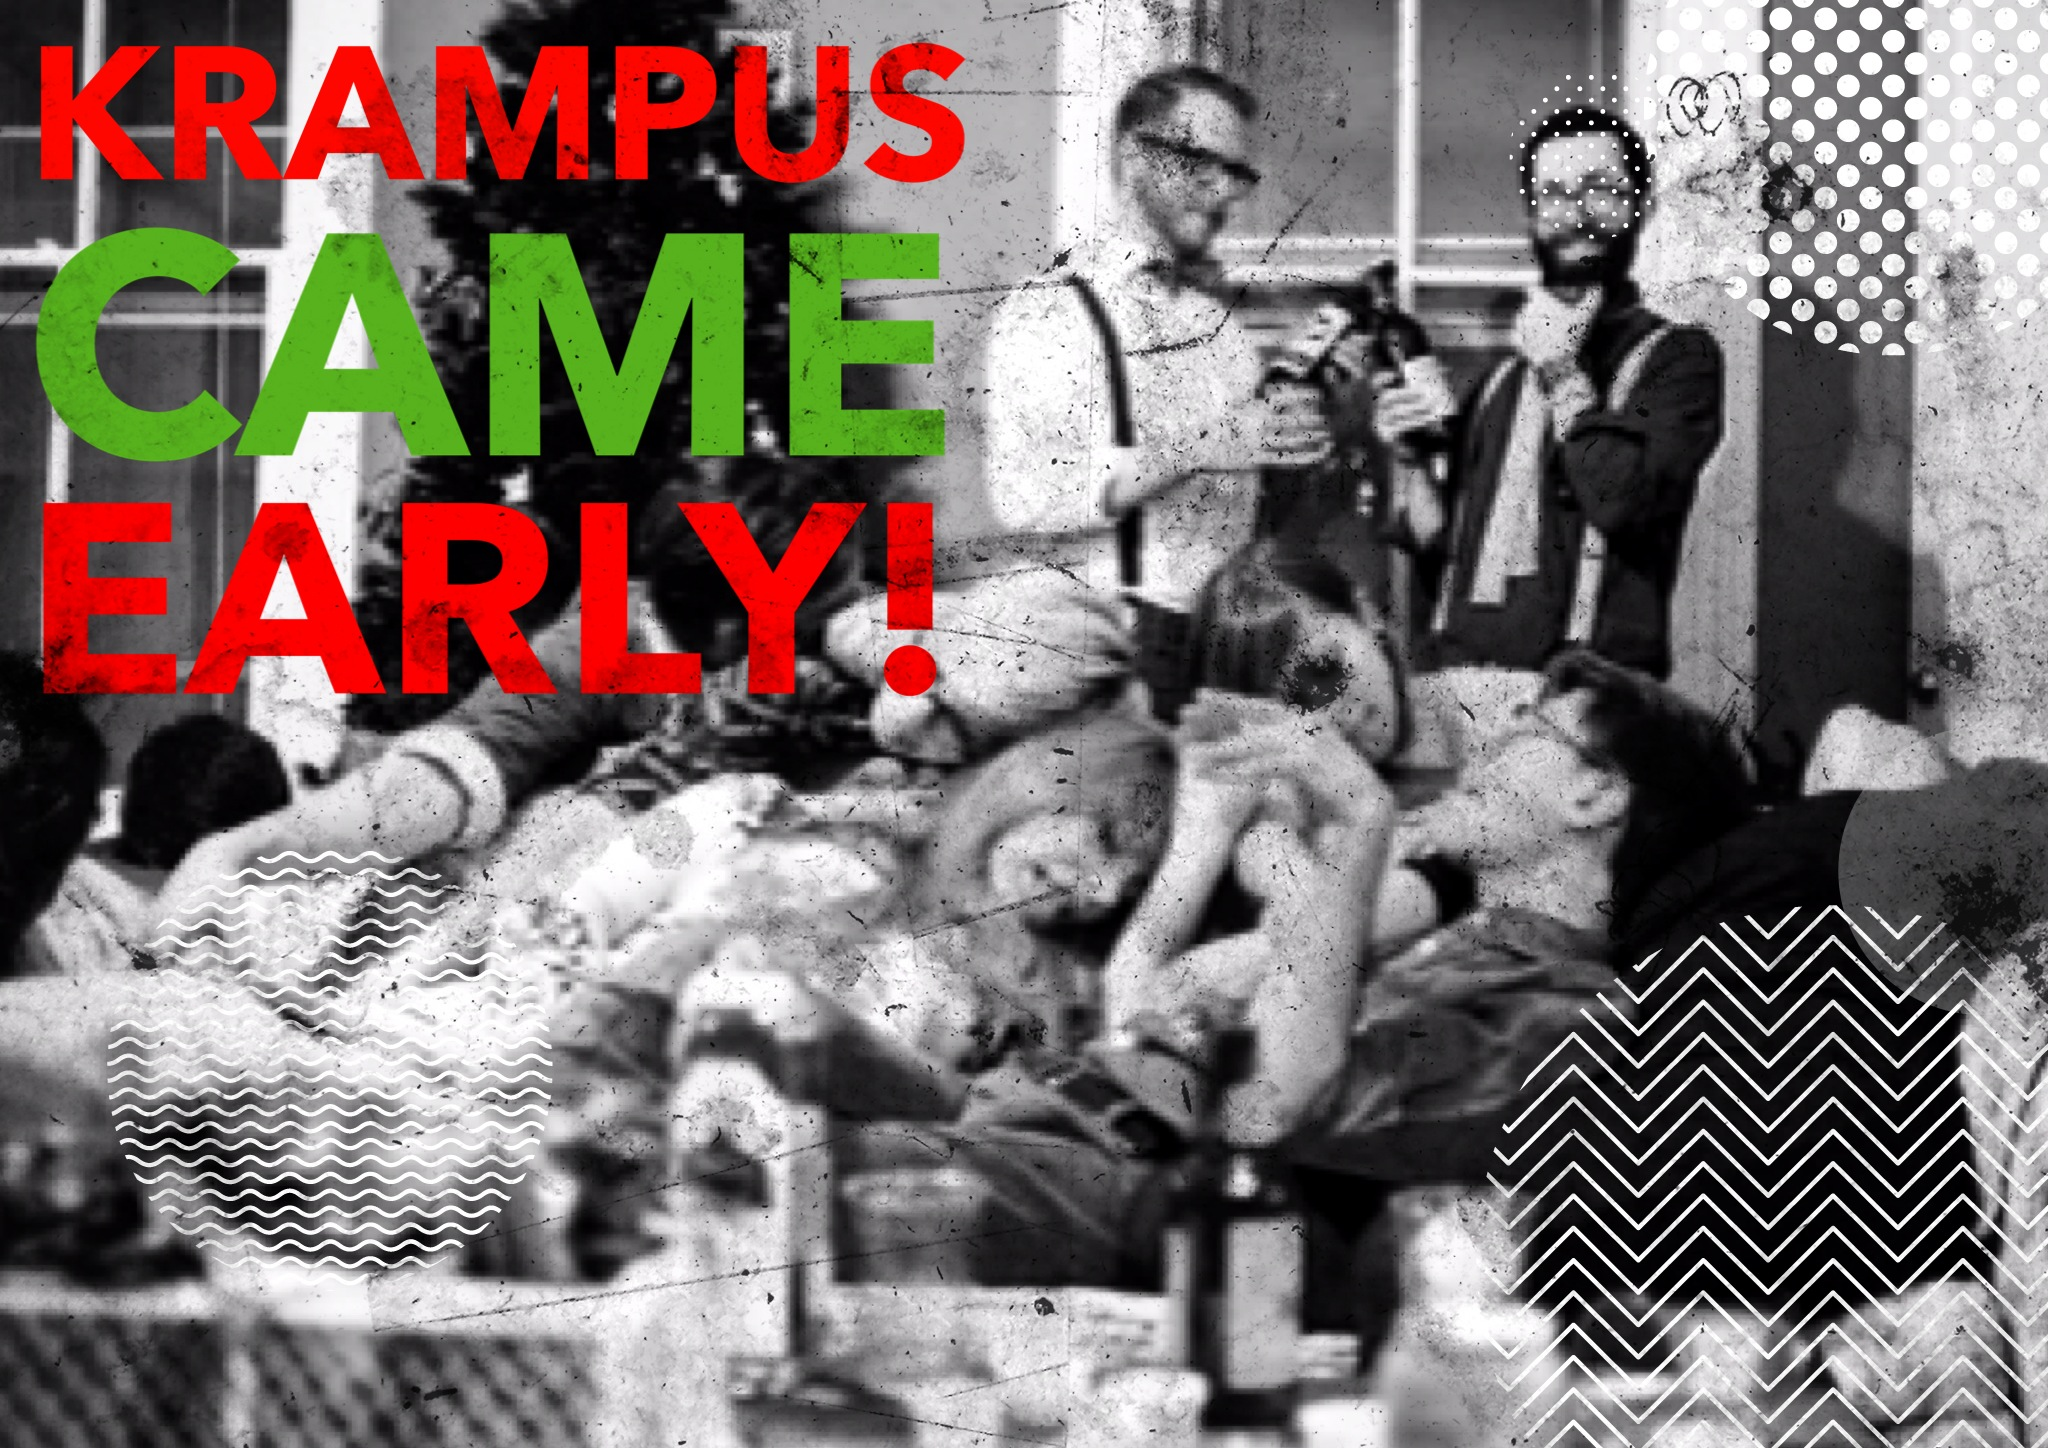 07 - Krampus Came Early.jpg